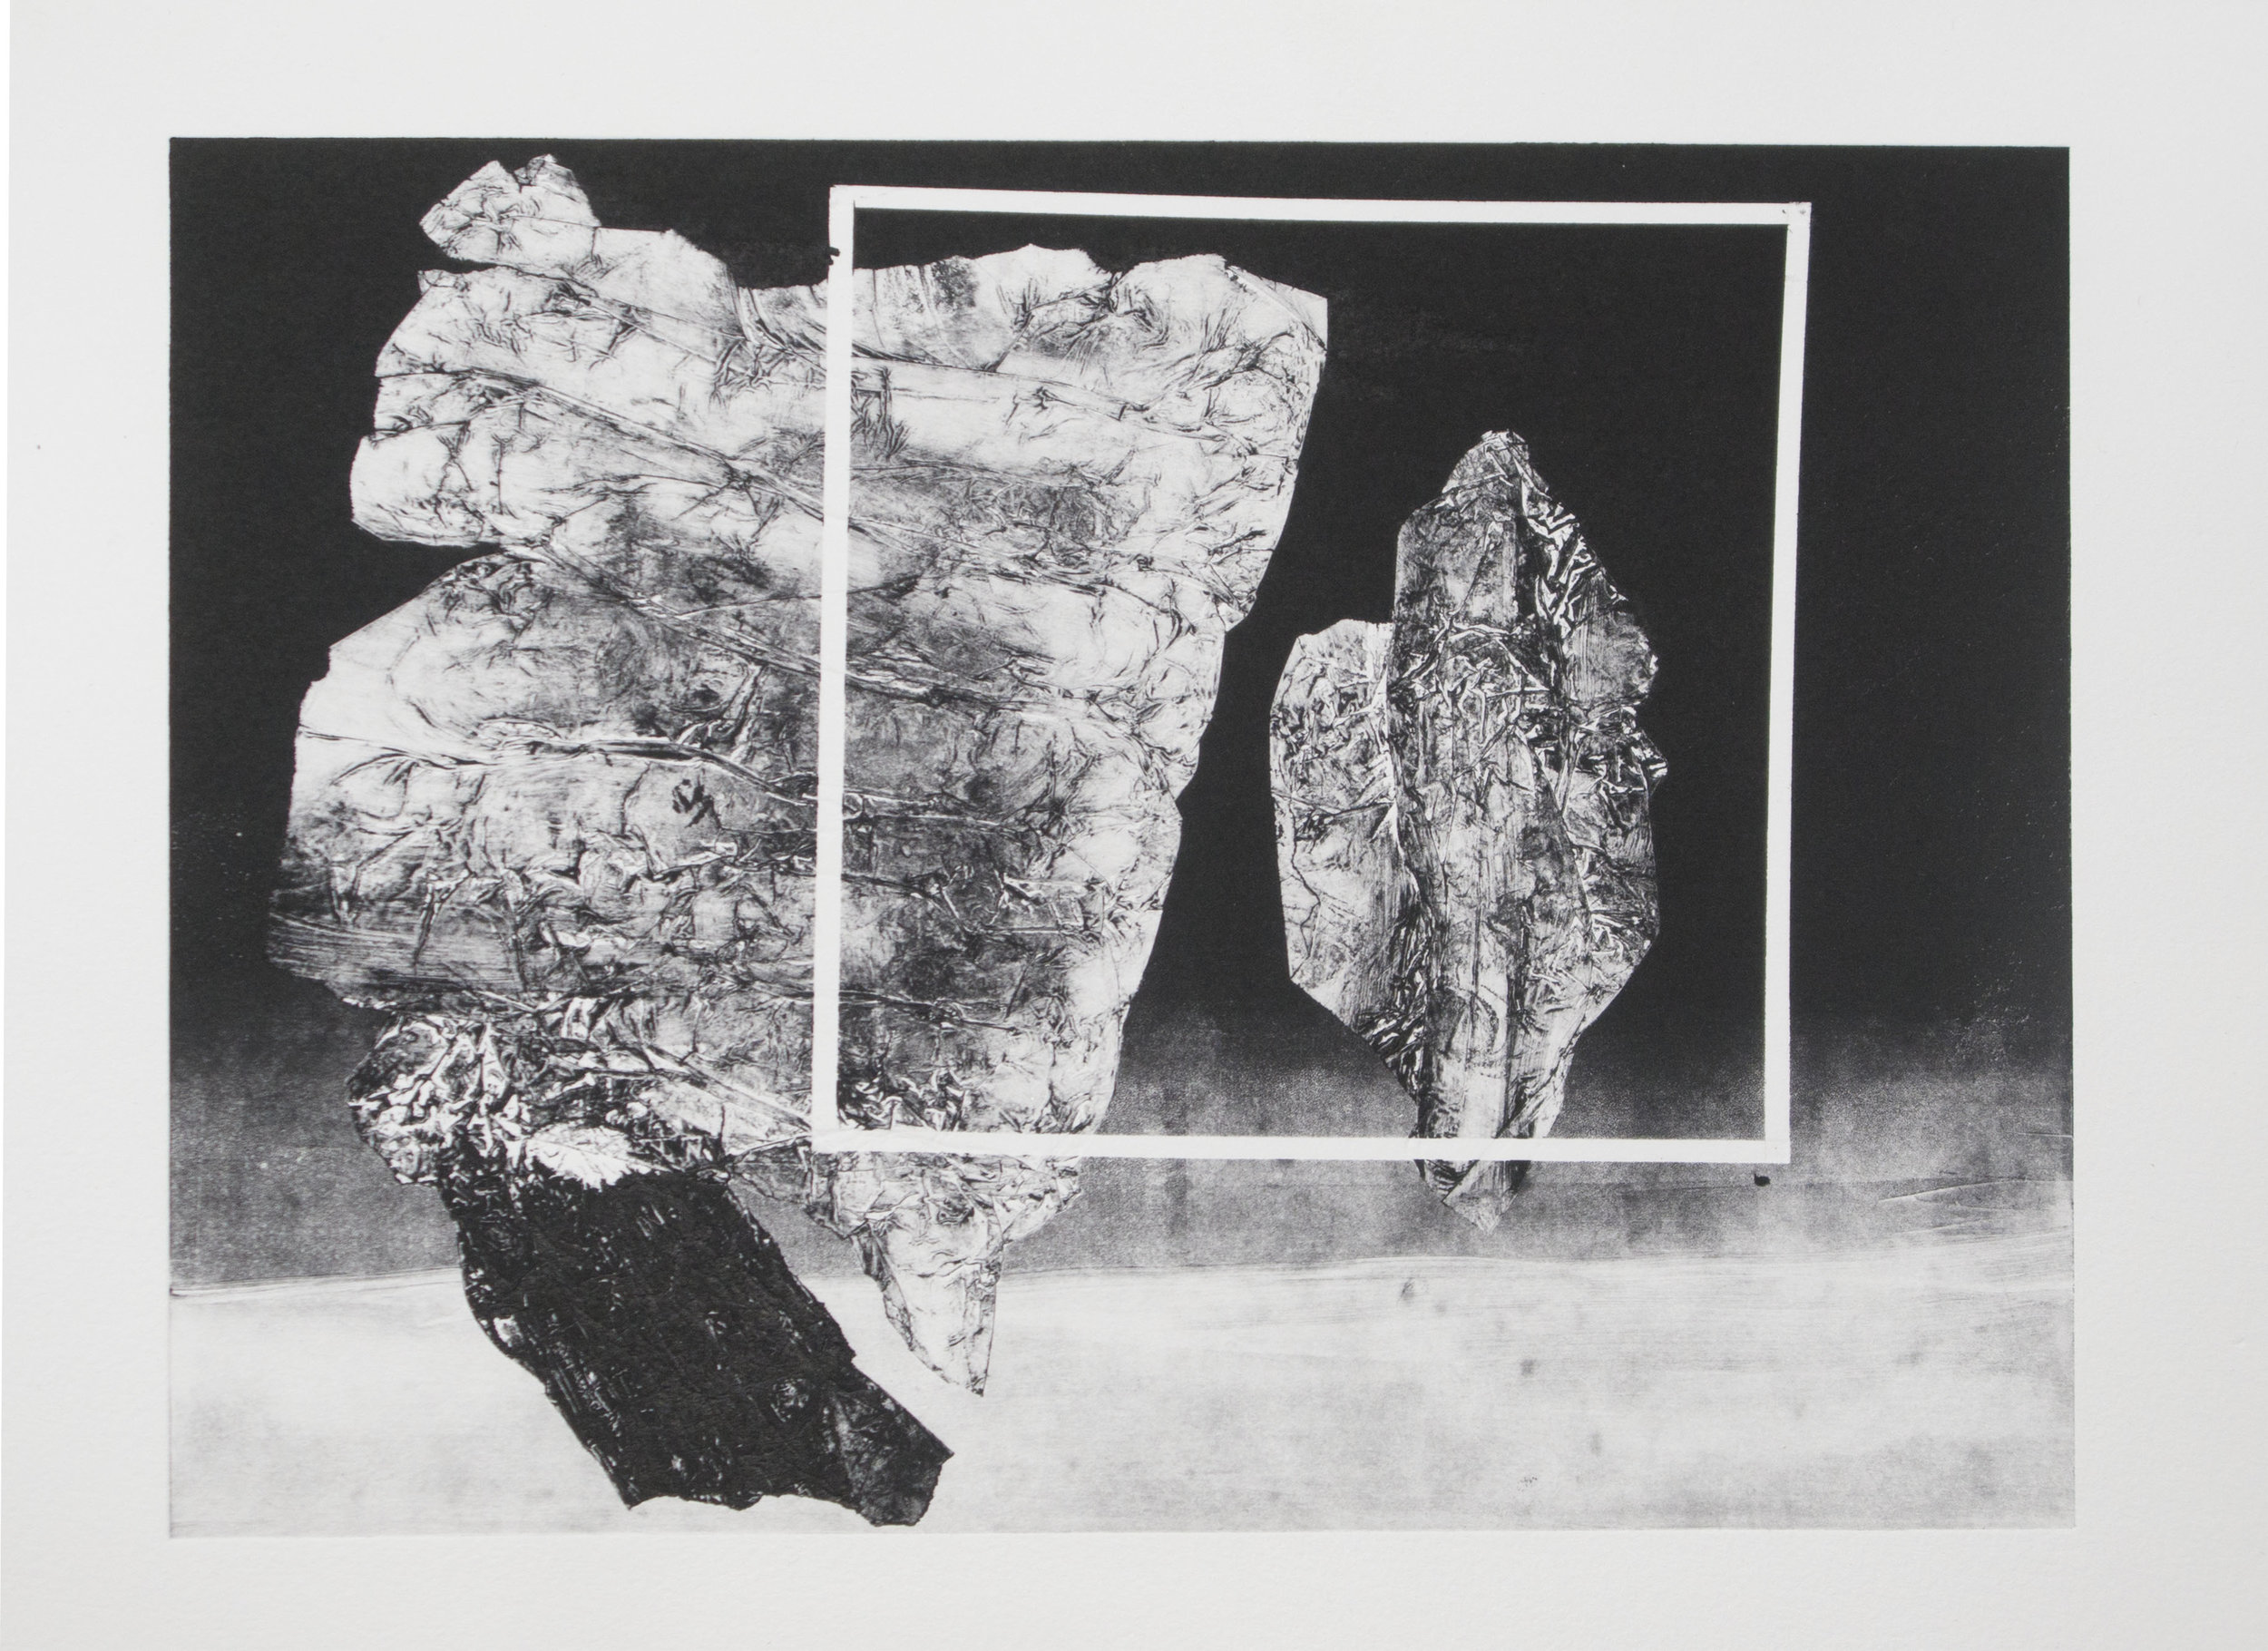 Forms on black 15 (32 cm x 26 cm)